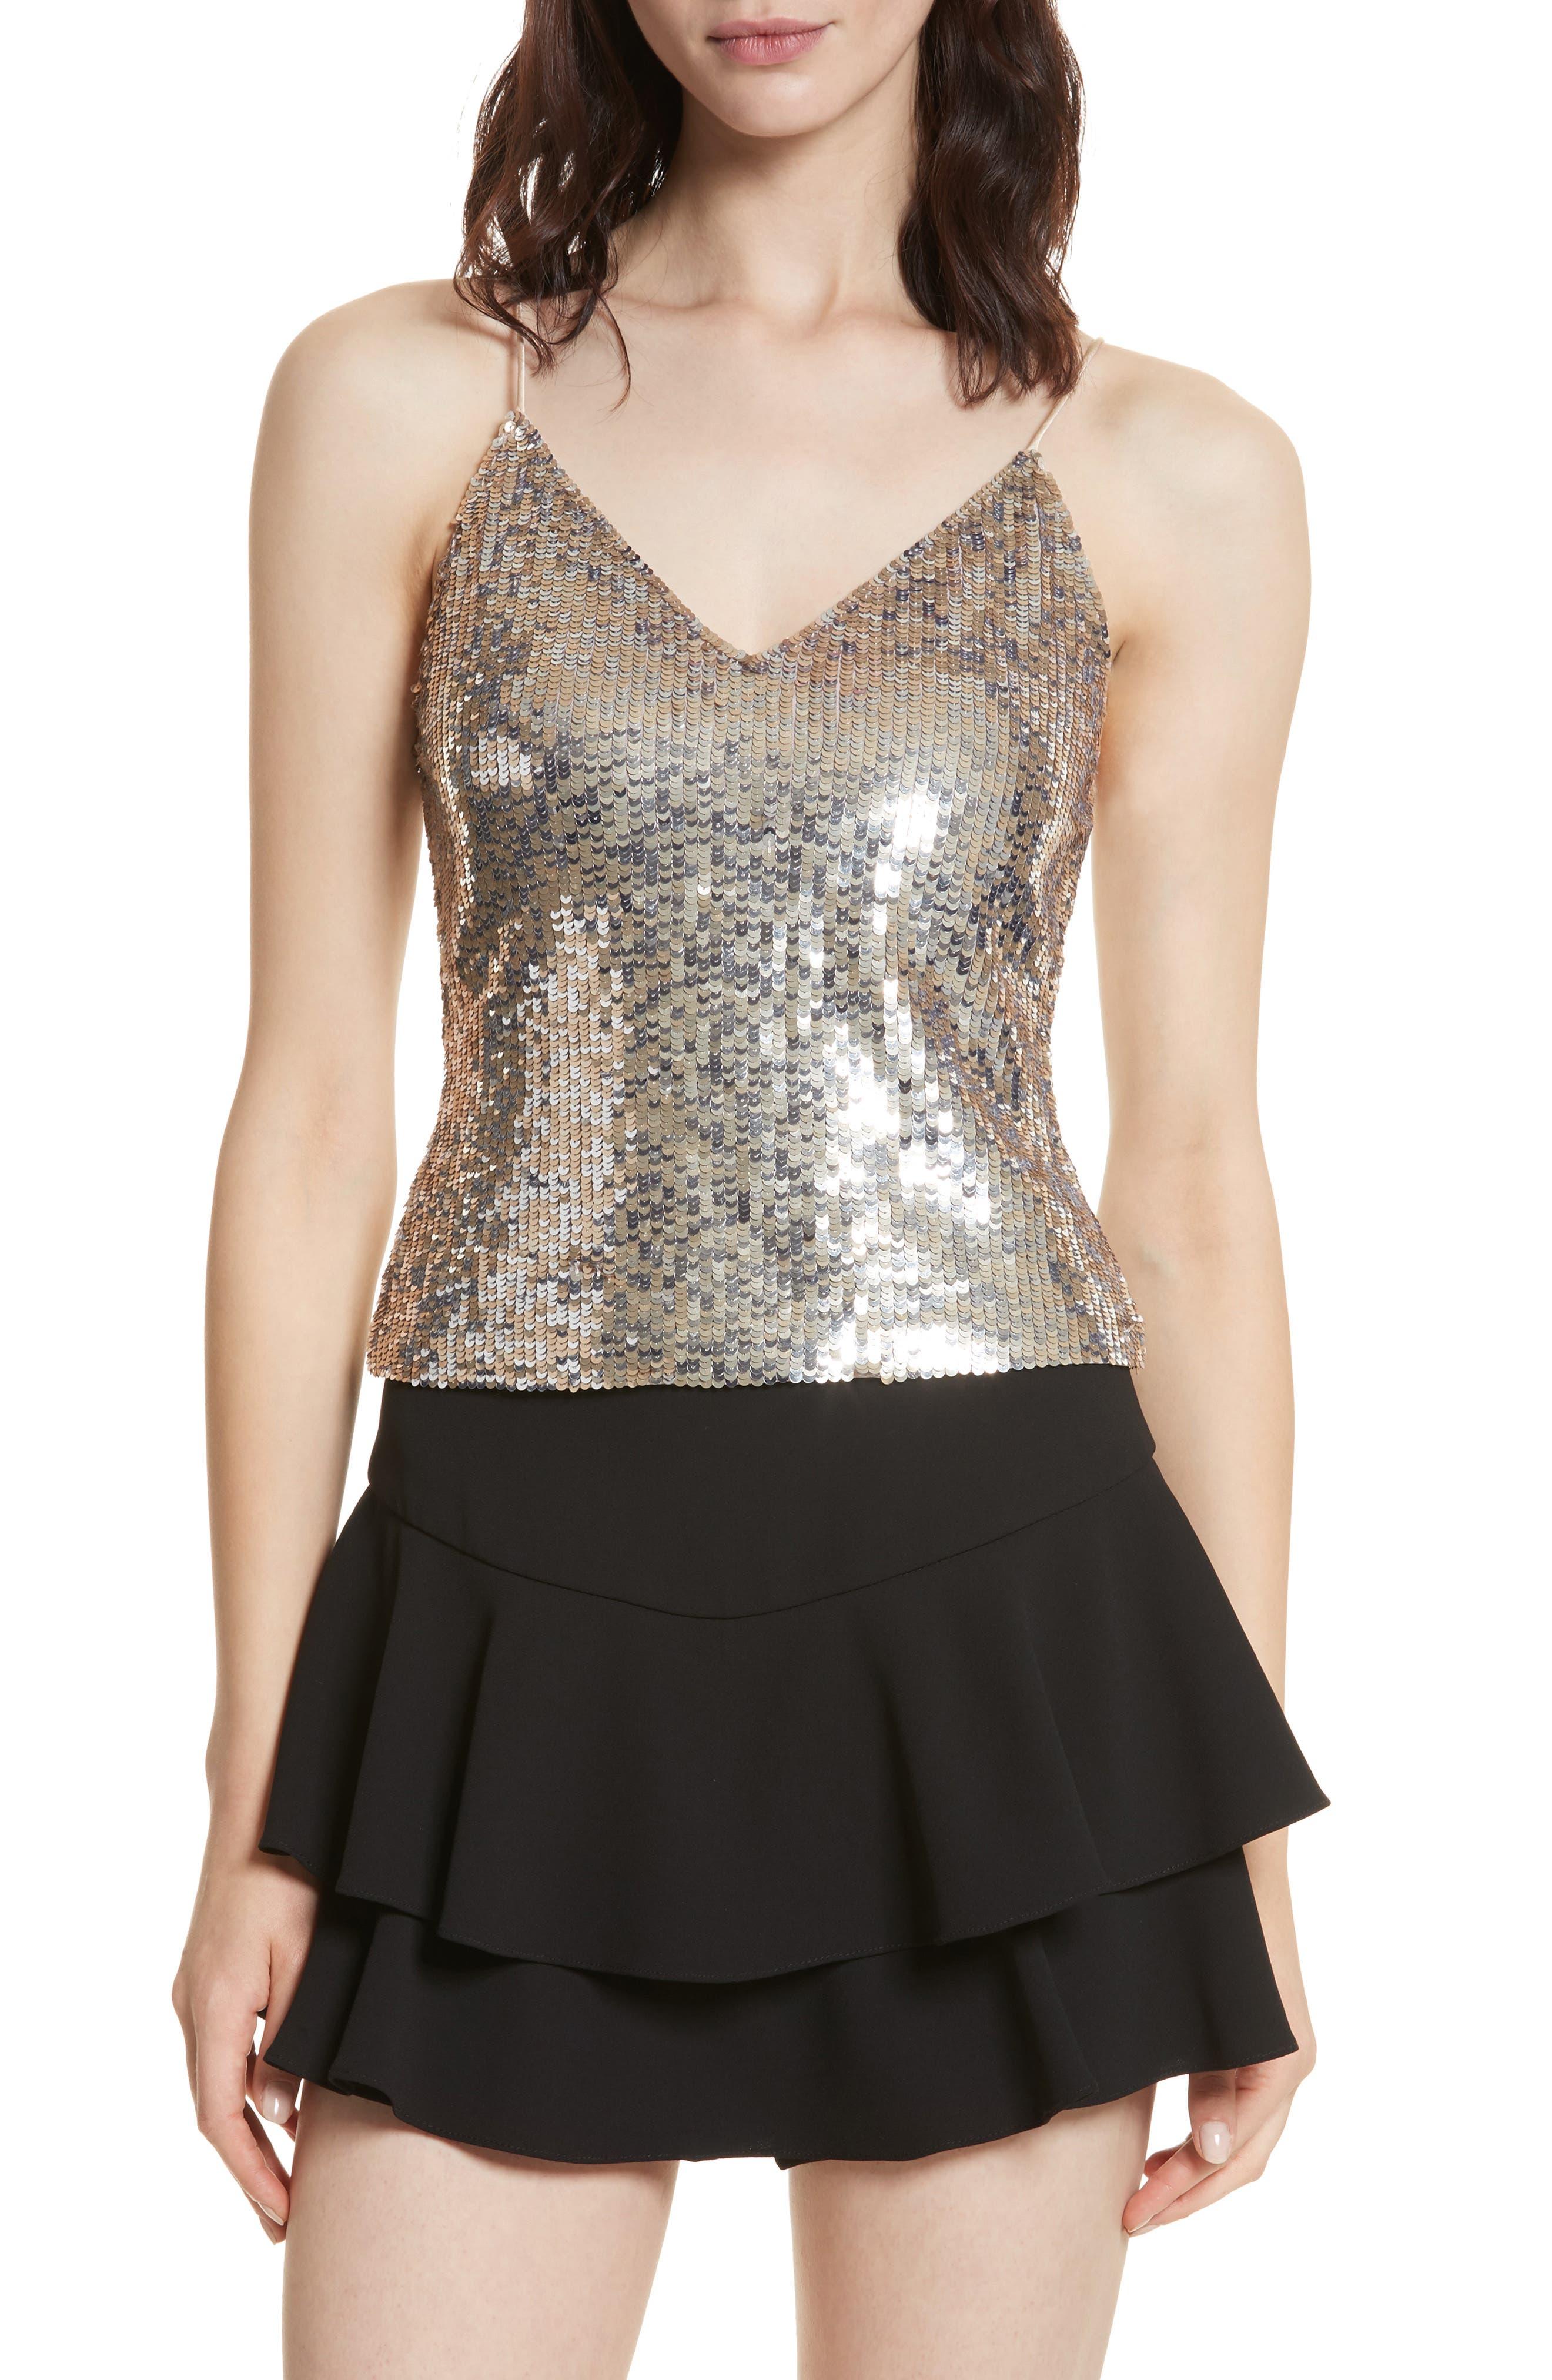 Alternate Image 1 Selected - Alice + Olivia Delray Sequin Embellished Camisole